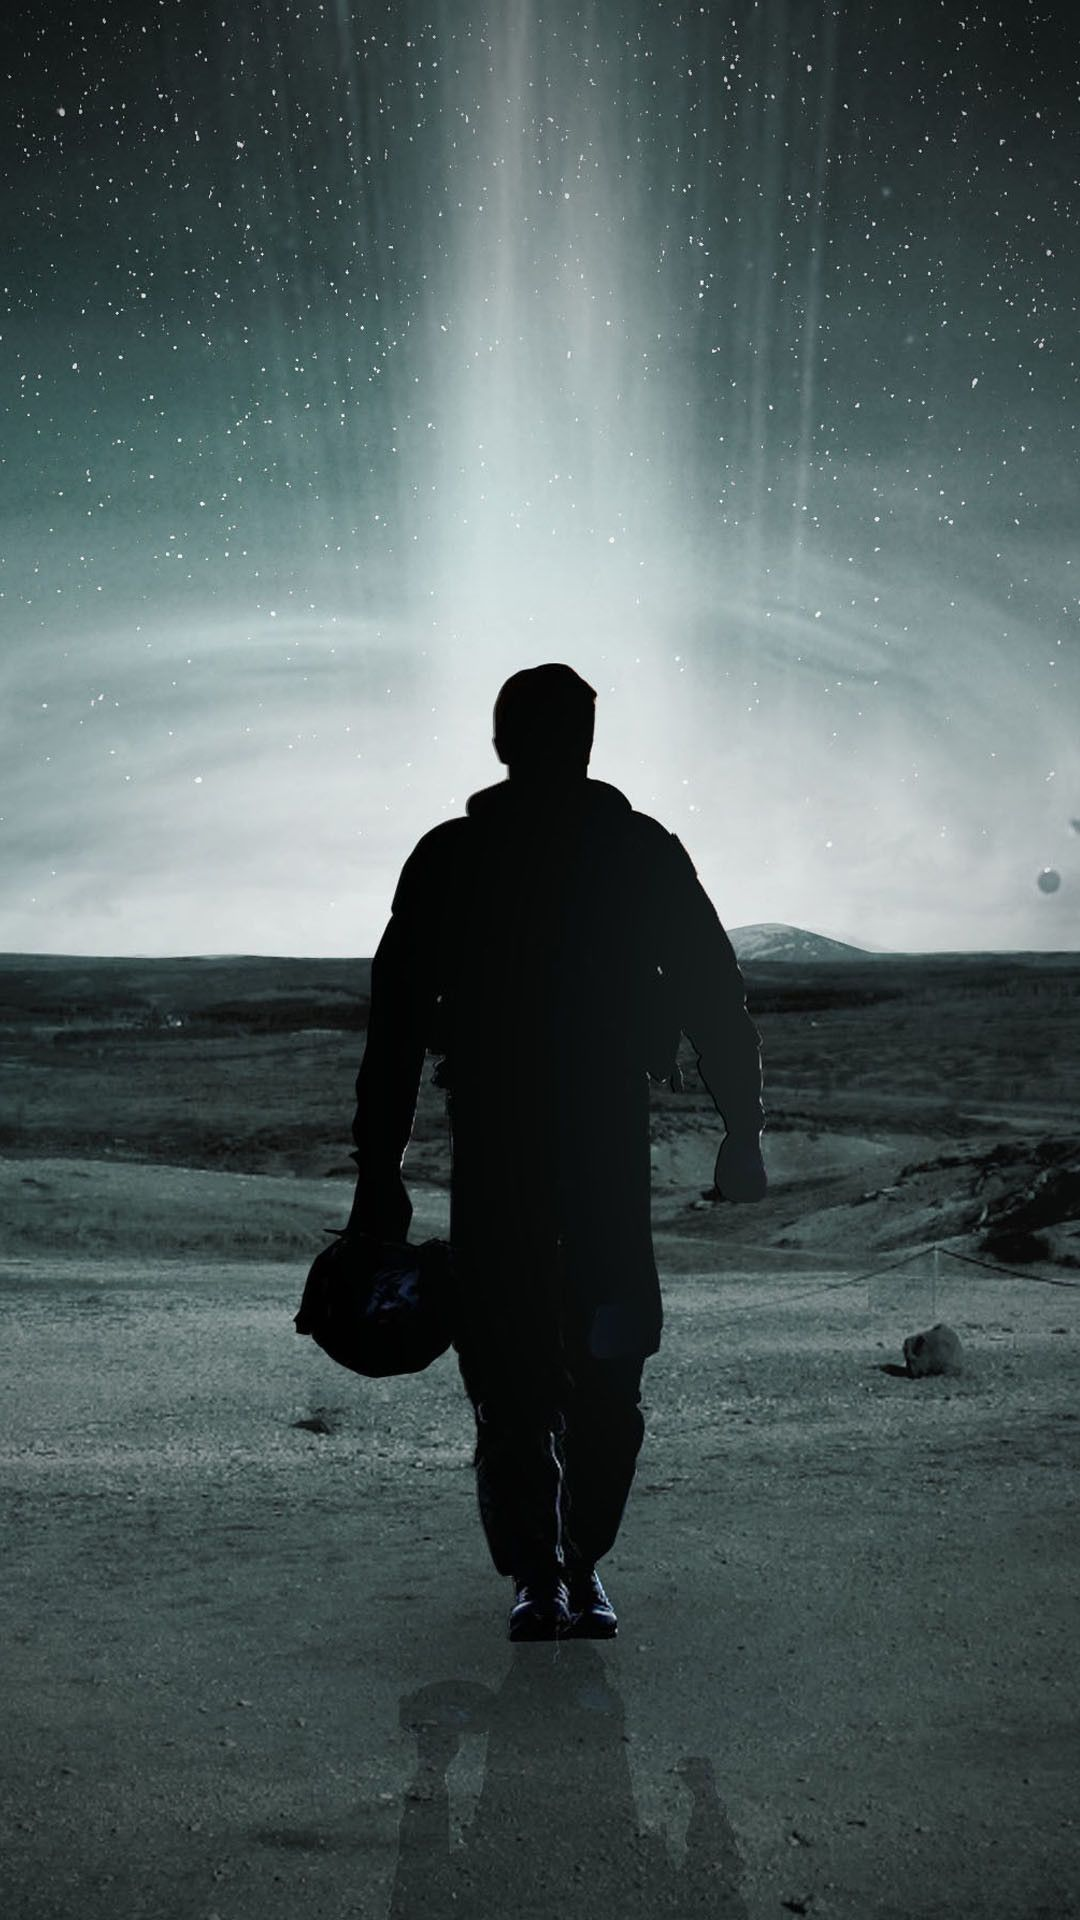 Interstellar Man Space Android Wallpaper Free Download Cine